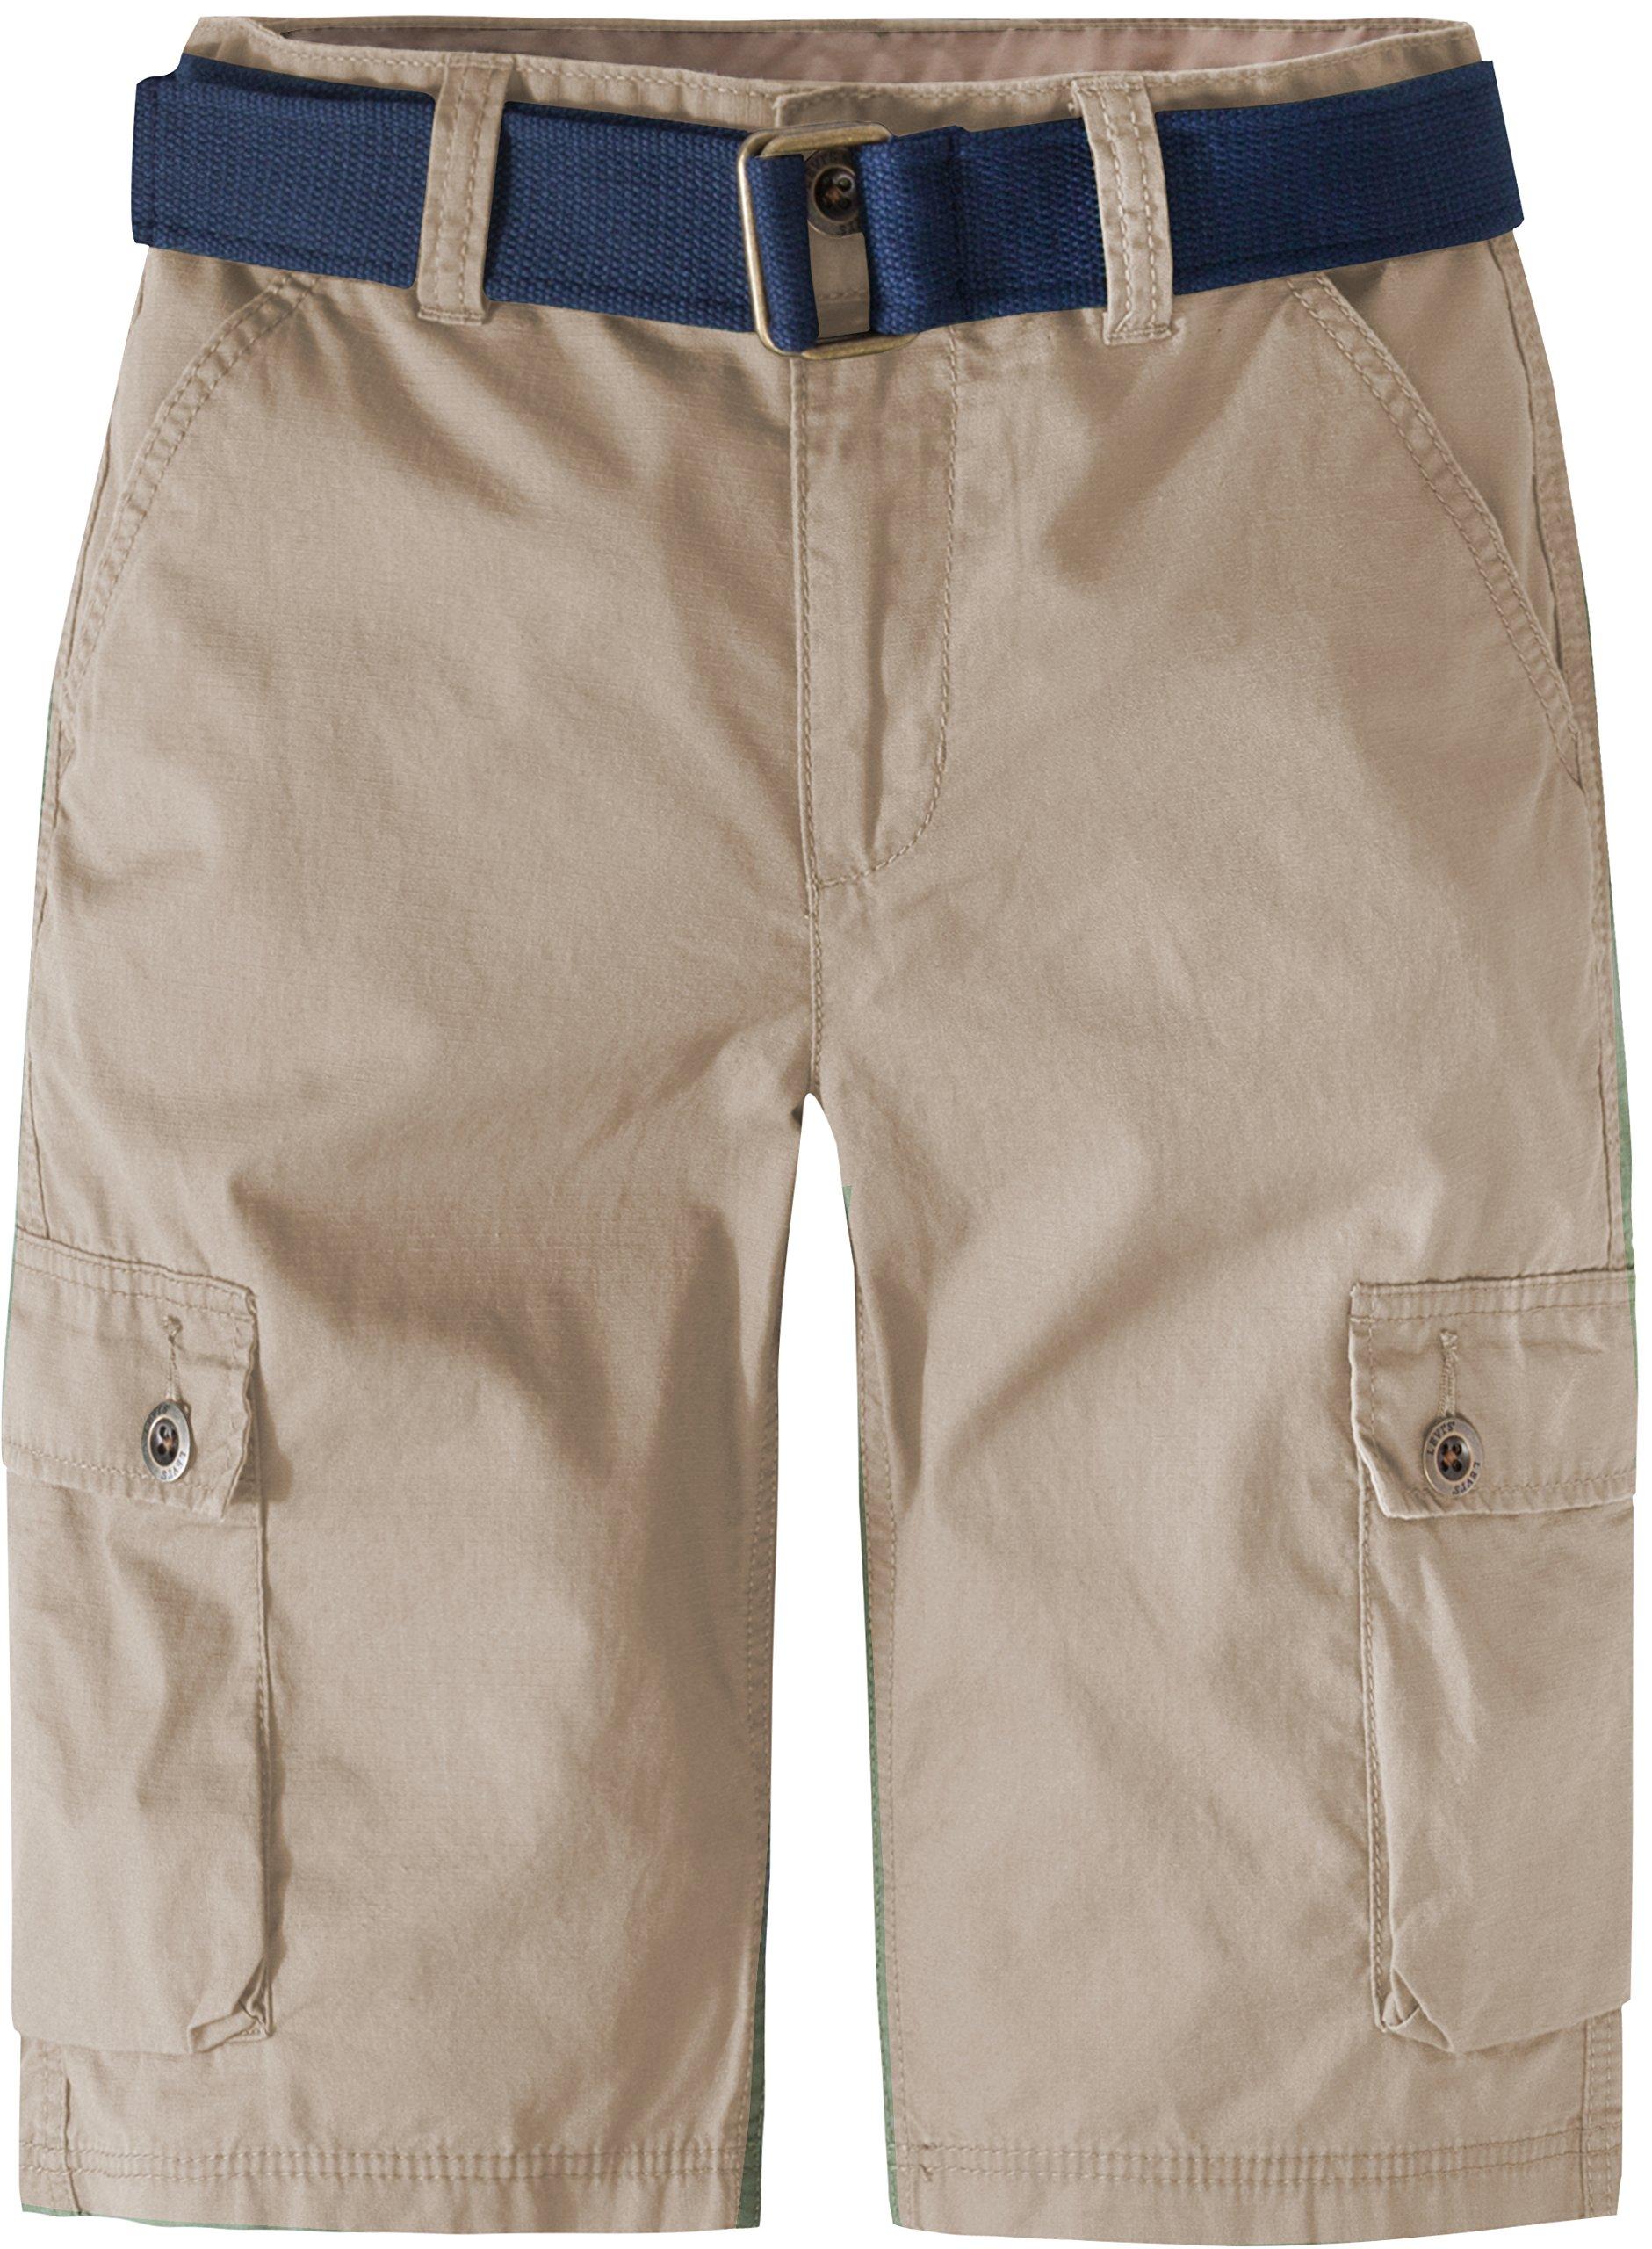 Levi's Big Boys' Cargo Shorts, Incense, 16